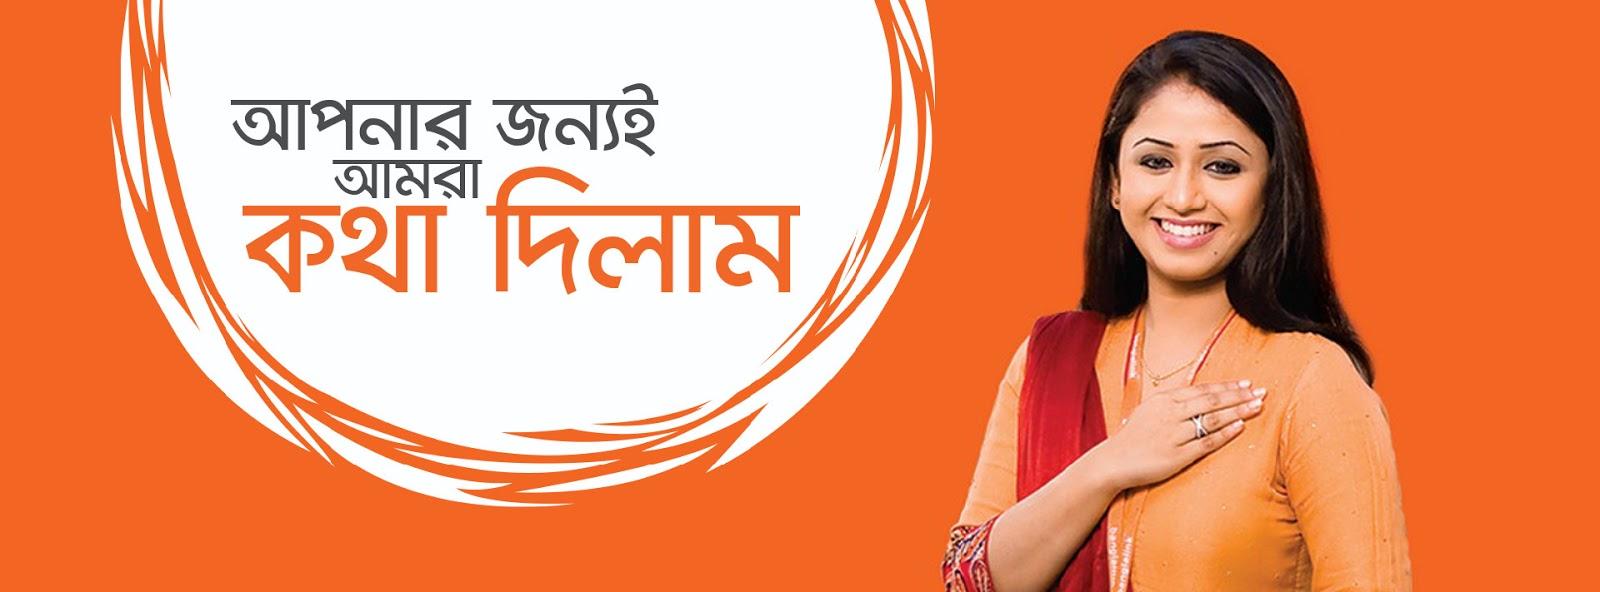 banglalink sim offer 2018.  bl new offer,  bl ar offer,  banglalink 1 tk 100 mb package full details , বাংলালিংক সিম অফার,  বাংলালিংক ১০০ এমবি ইন্টারনেট অফার,  বাংলাণিংক ১ টাকা ইন্টারনেট প্যাঁকেজ। বিস্তারিত কিবাভে কিনব,  কেনার কোড।